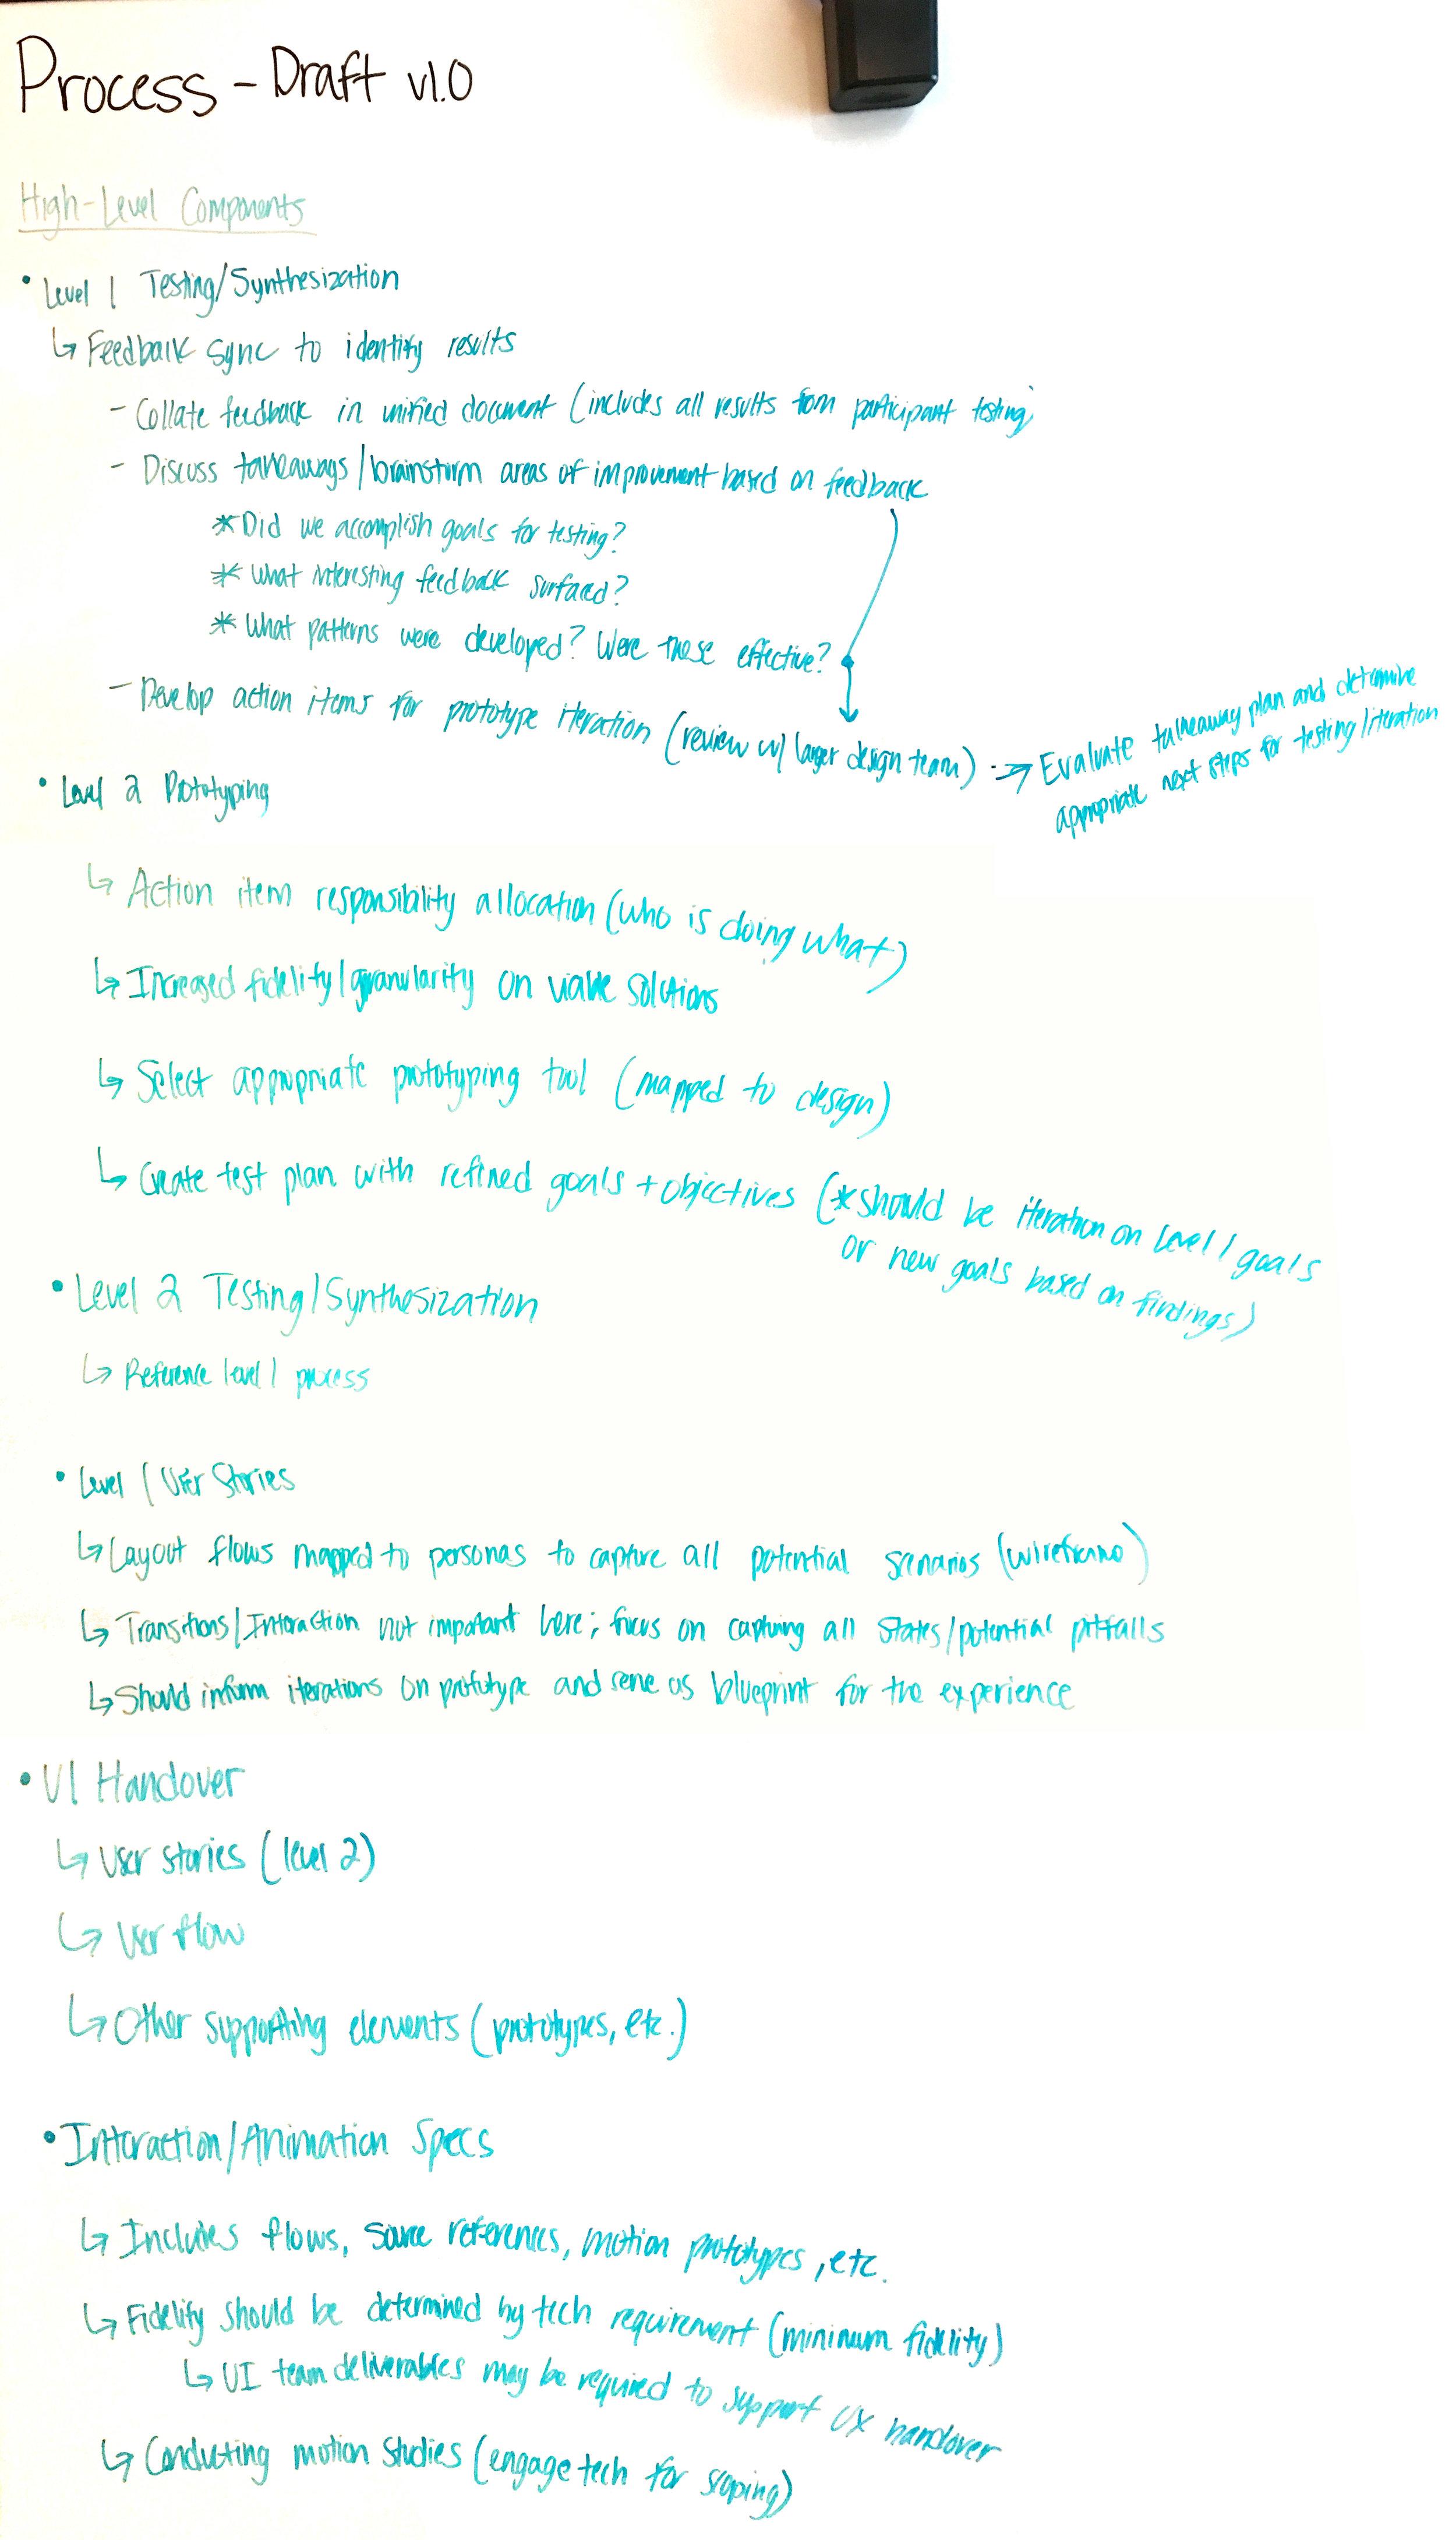 espn-process-highlevel-document.jpg